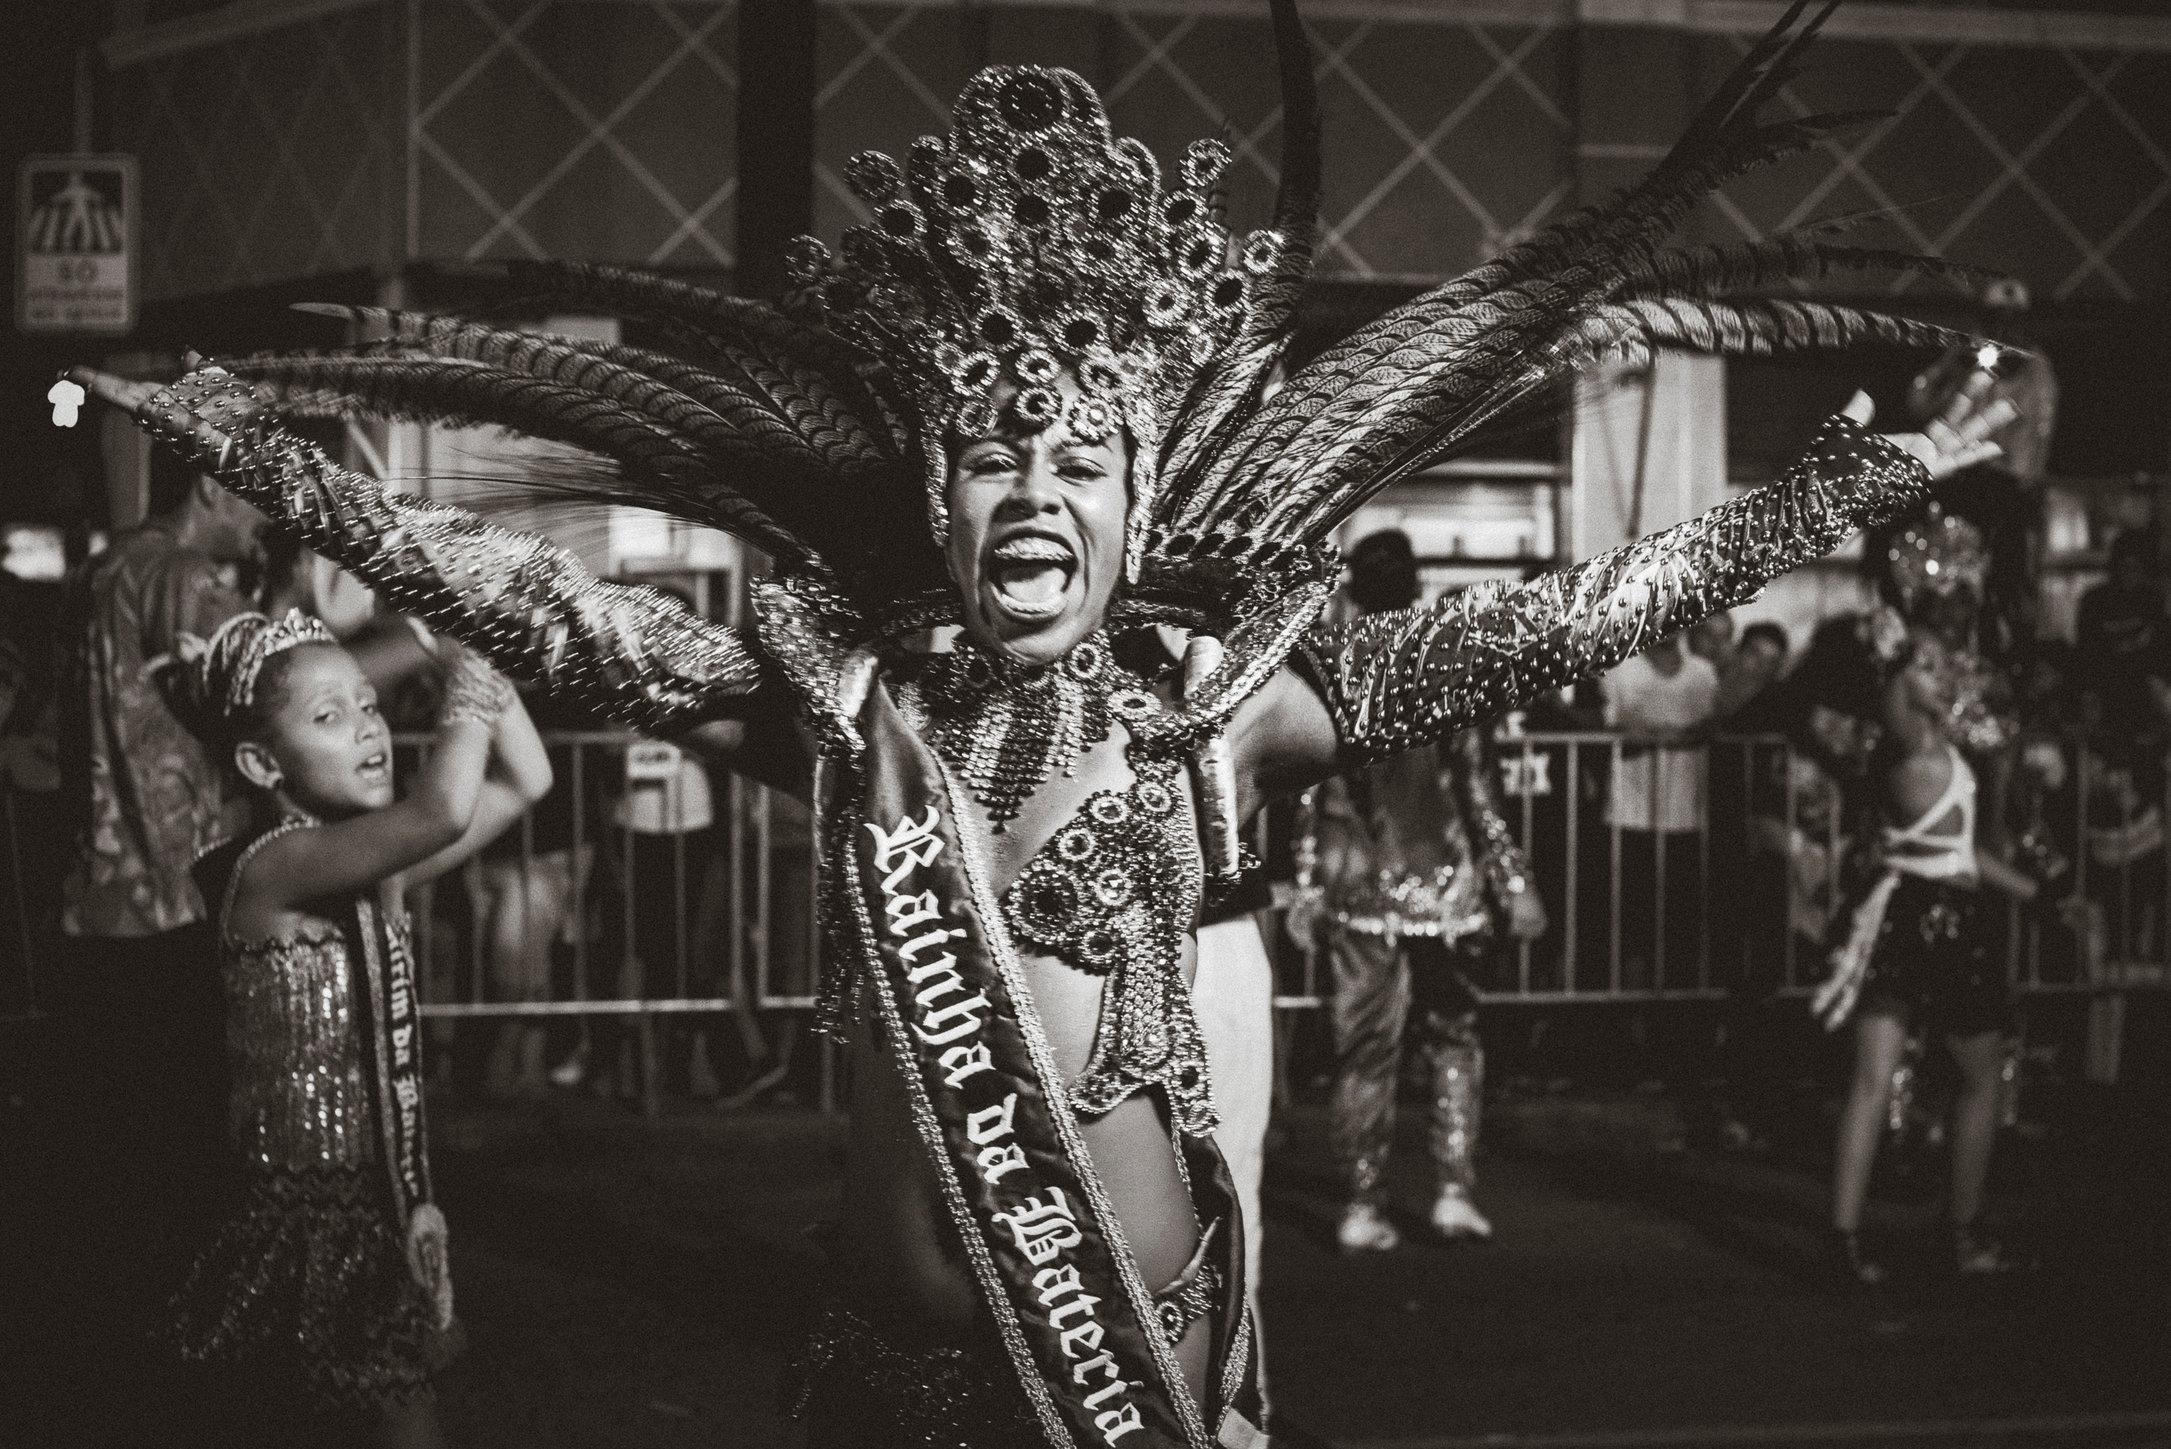 20180211-Carnaval-122.jpg